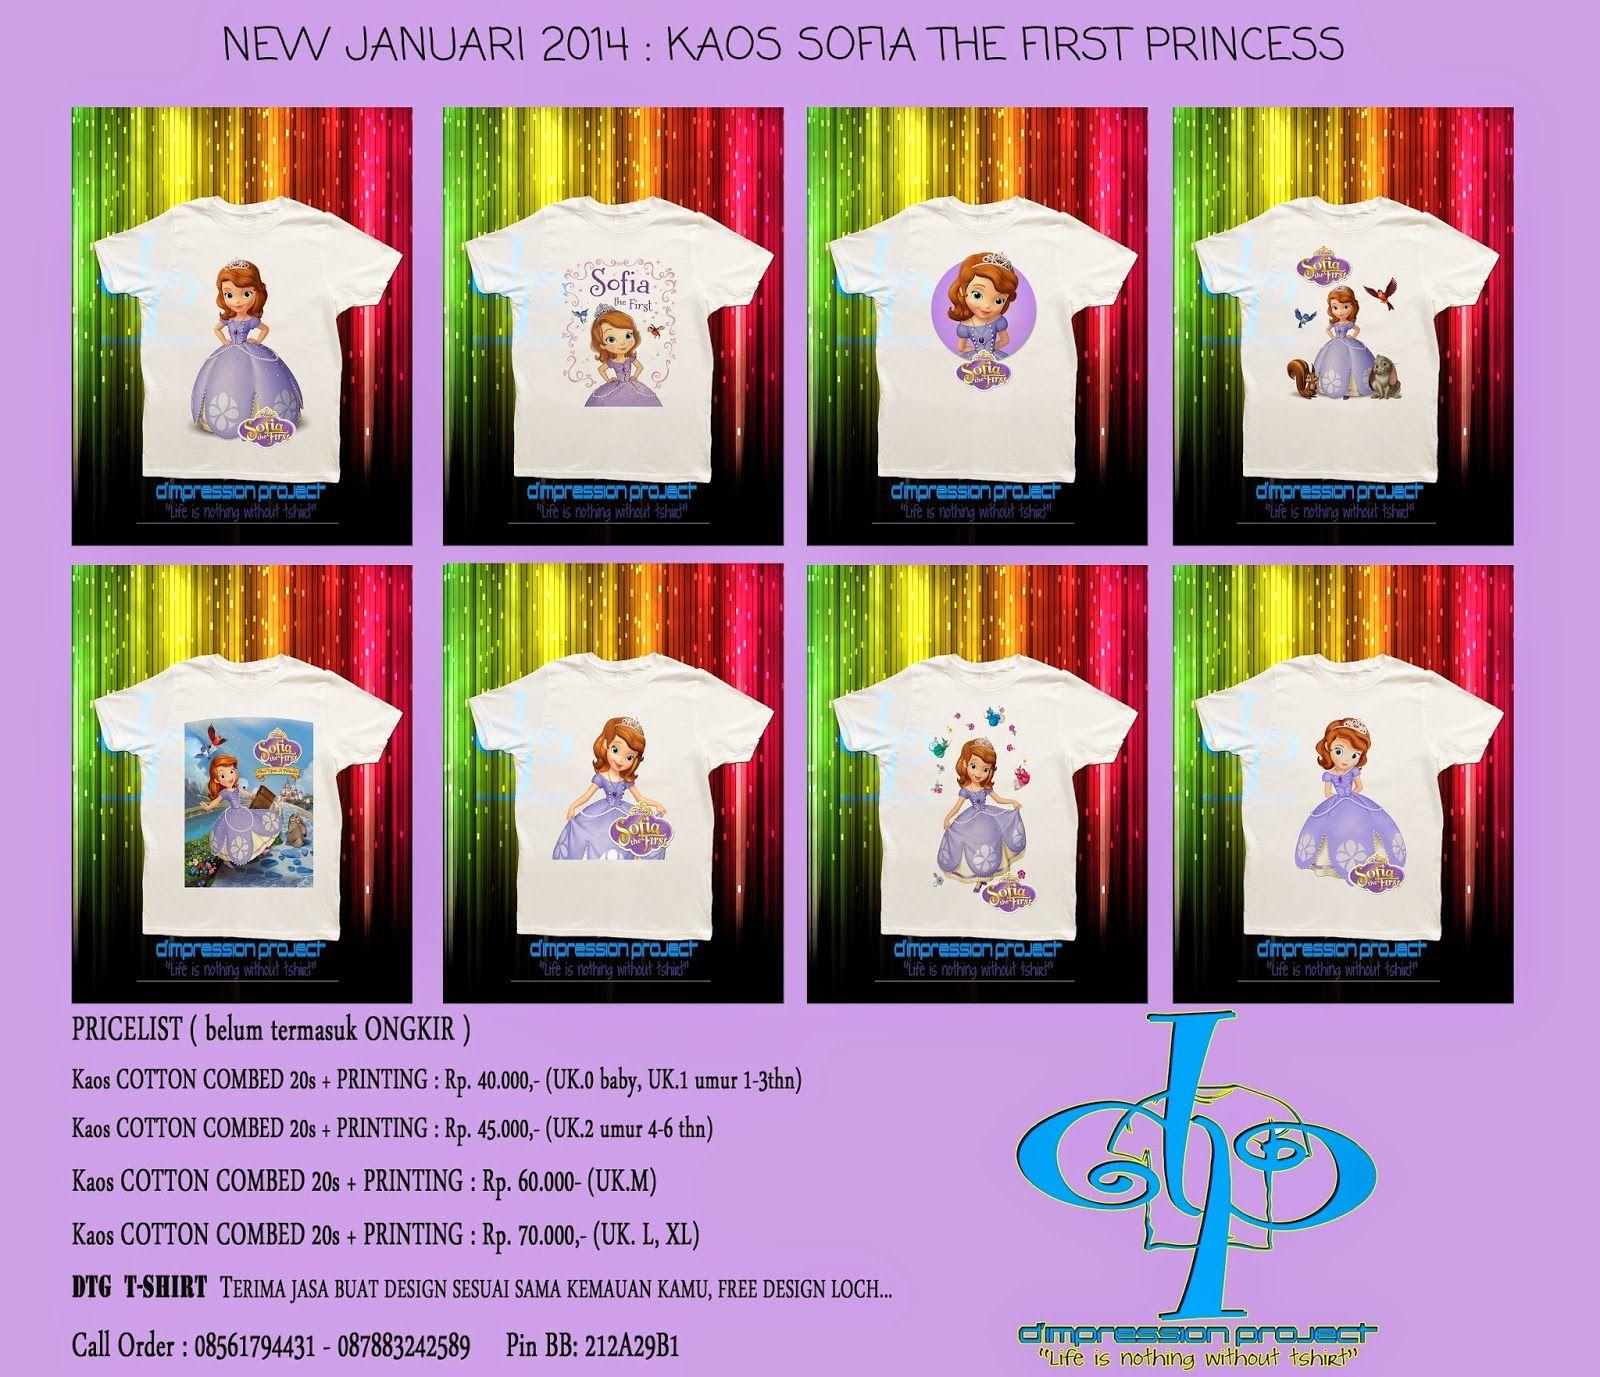 Jual Kaos Anak Sofia The First Princess Project Design Printing